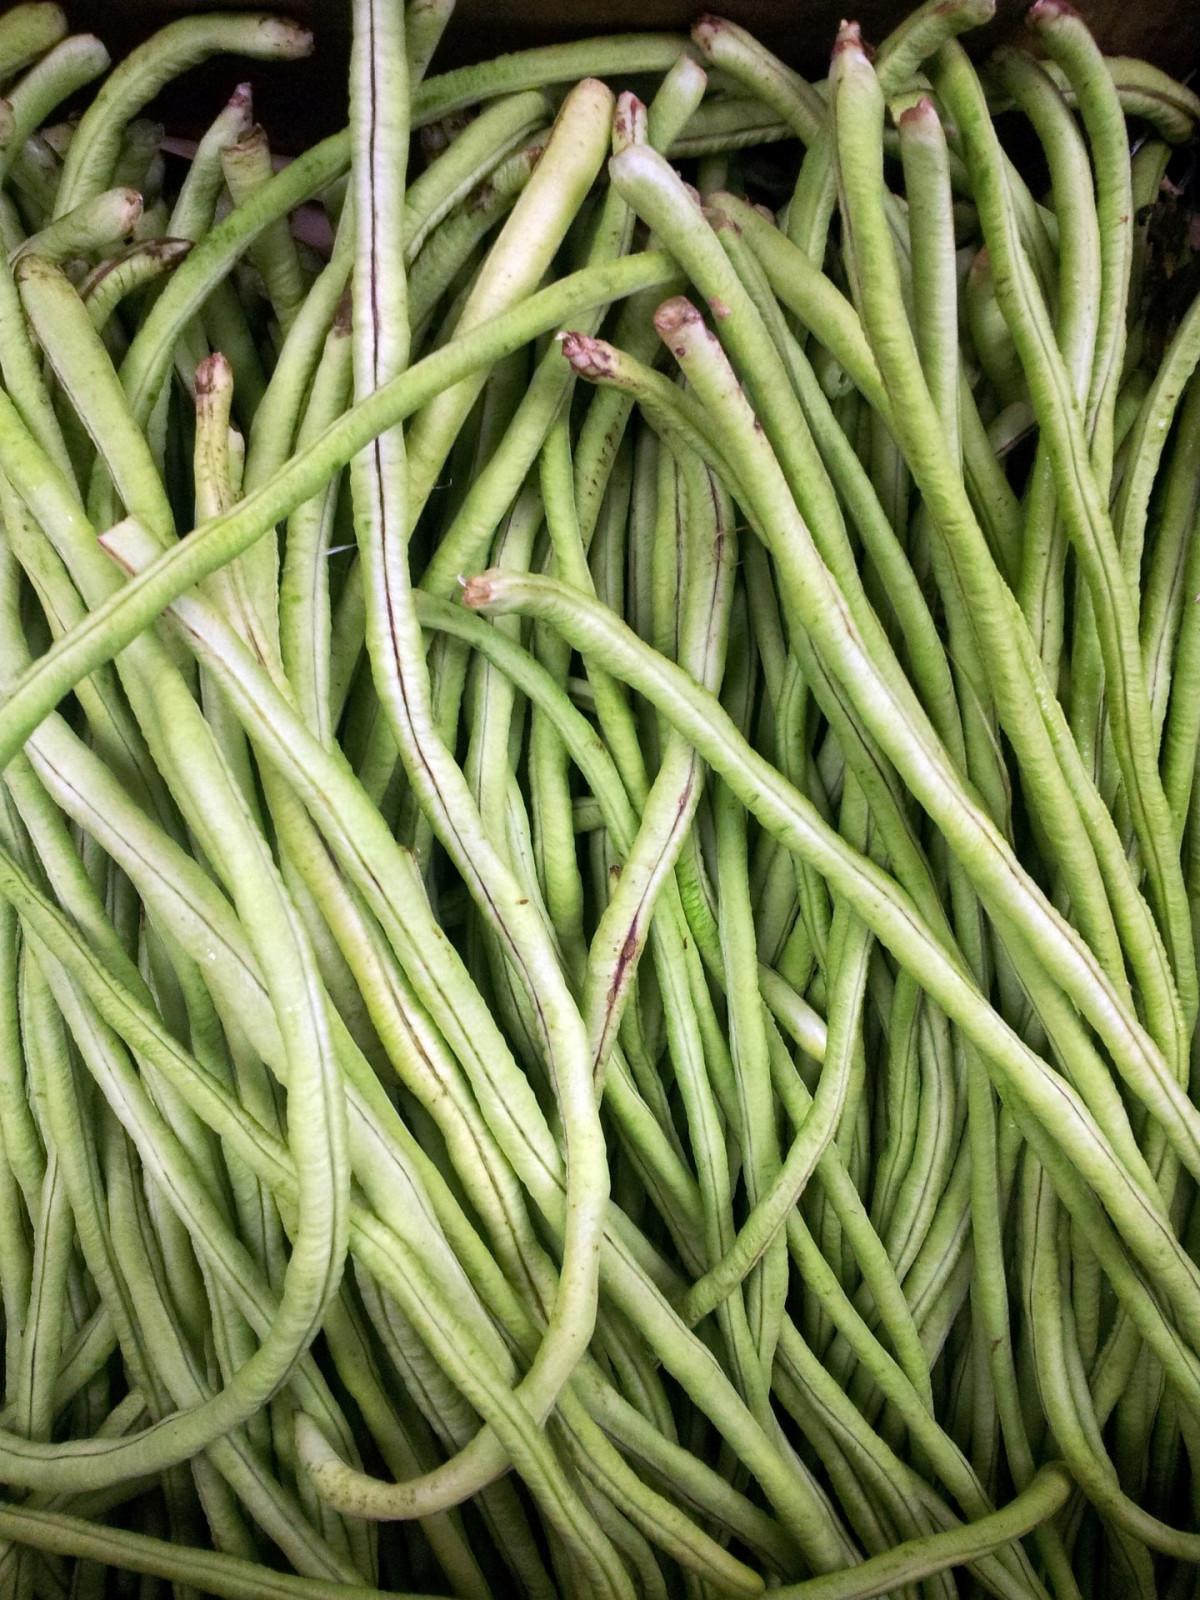 images gratuites haricot aliments cuisine herbe produire l gume surgir agriculture. Black Bedroom Furniture Sets. Home Design Ideas